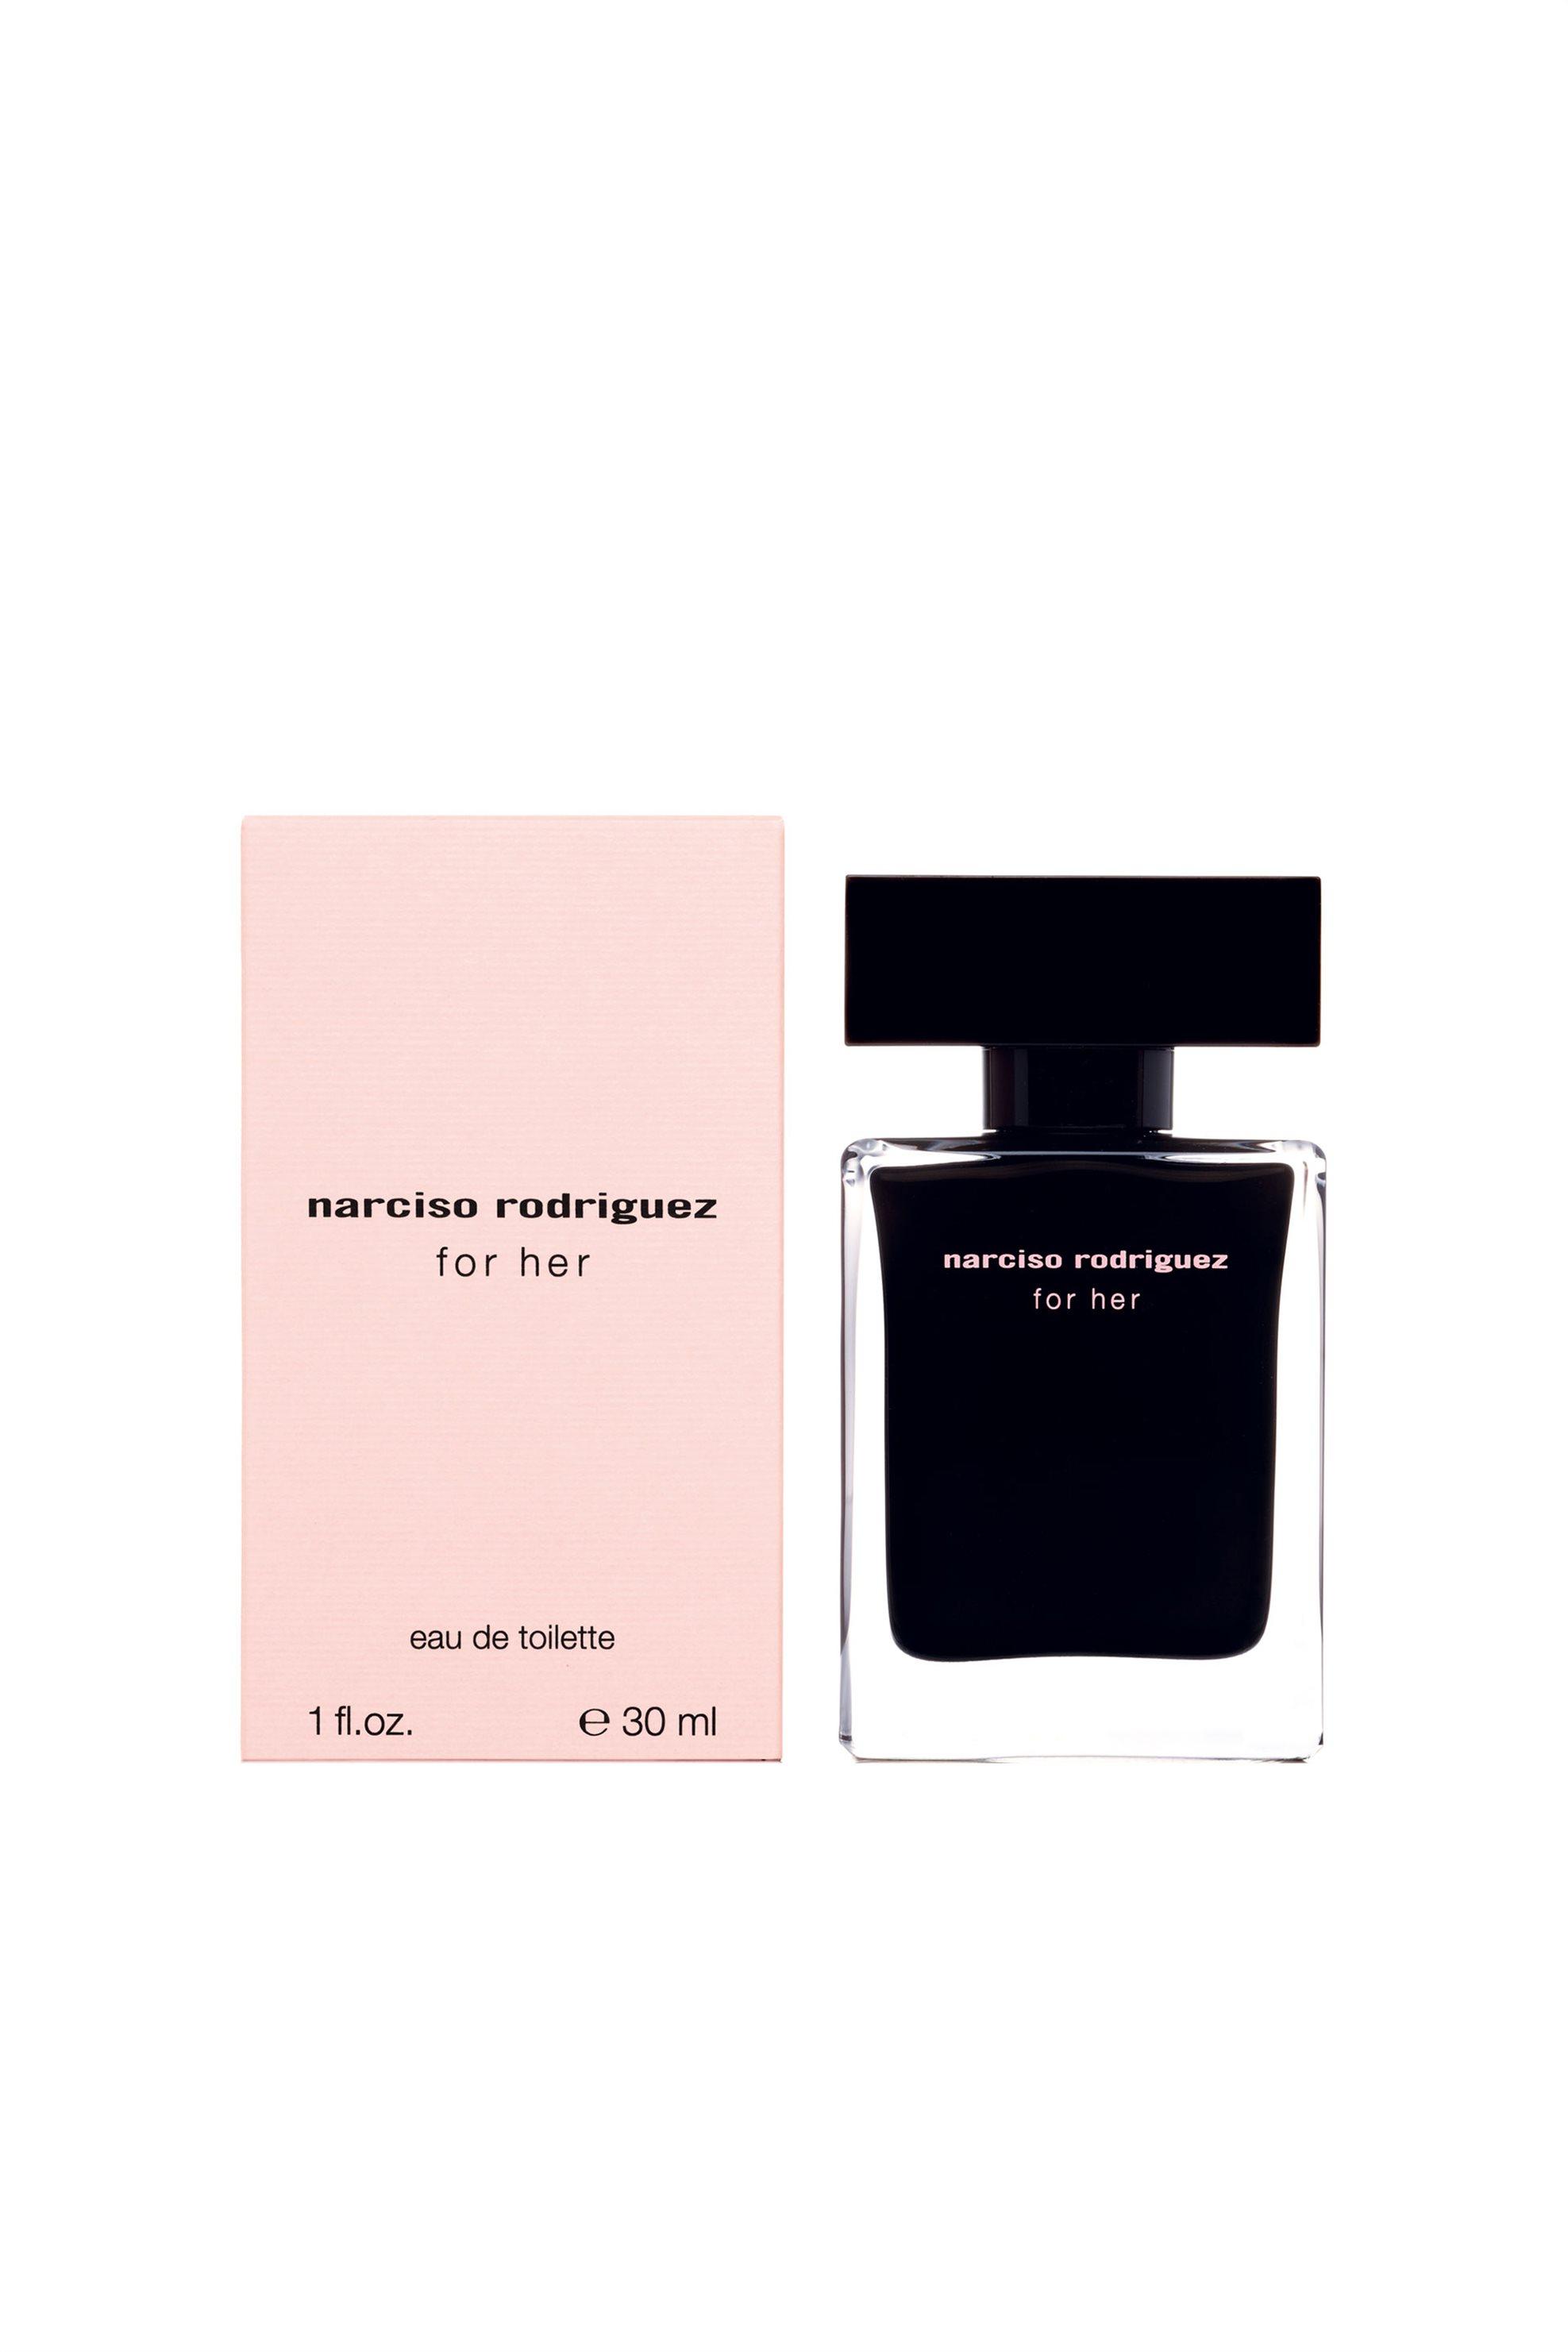 Narciso Rodriguez Narciso Rodriguez For Her EdT 30 ml - 89256500000 ομορφια   καλλυντικα επιλεκτικησ   αρώματα   γυναικεία αρώματα   eau de parfum